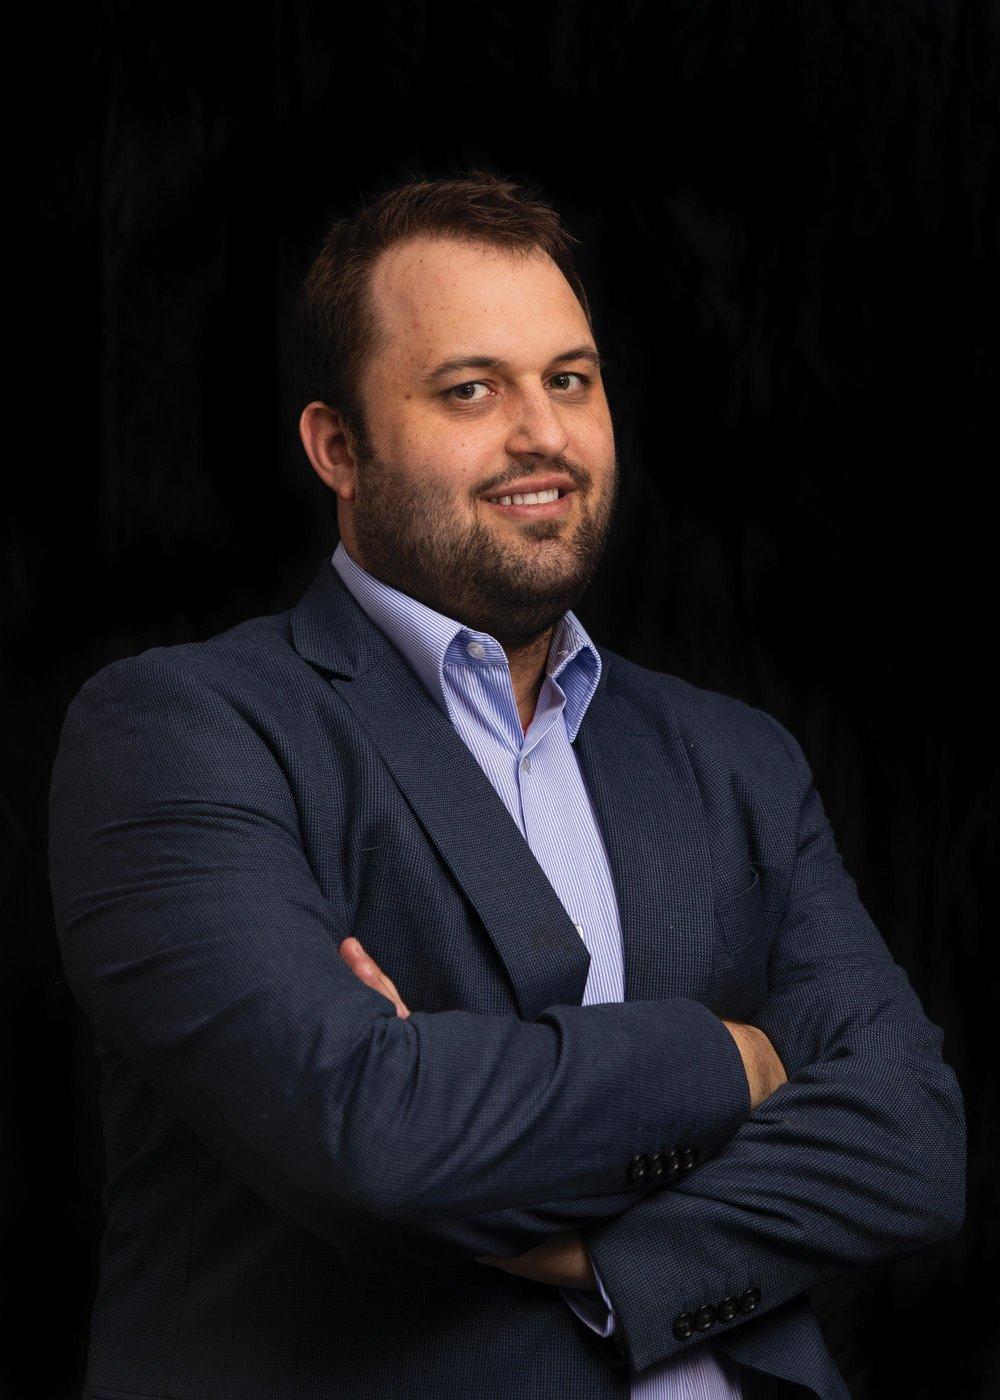 Nik Nelson - Executive Producer